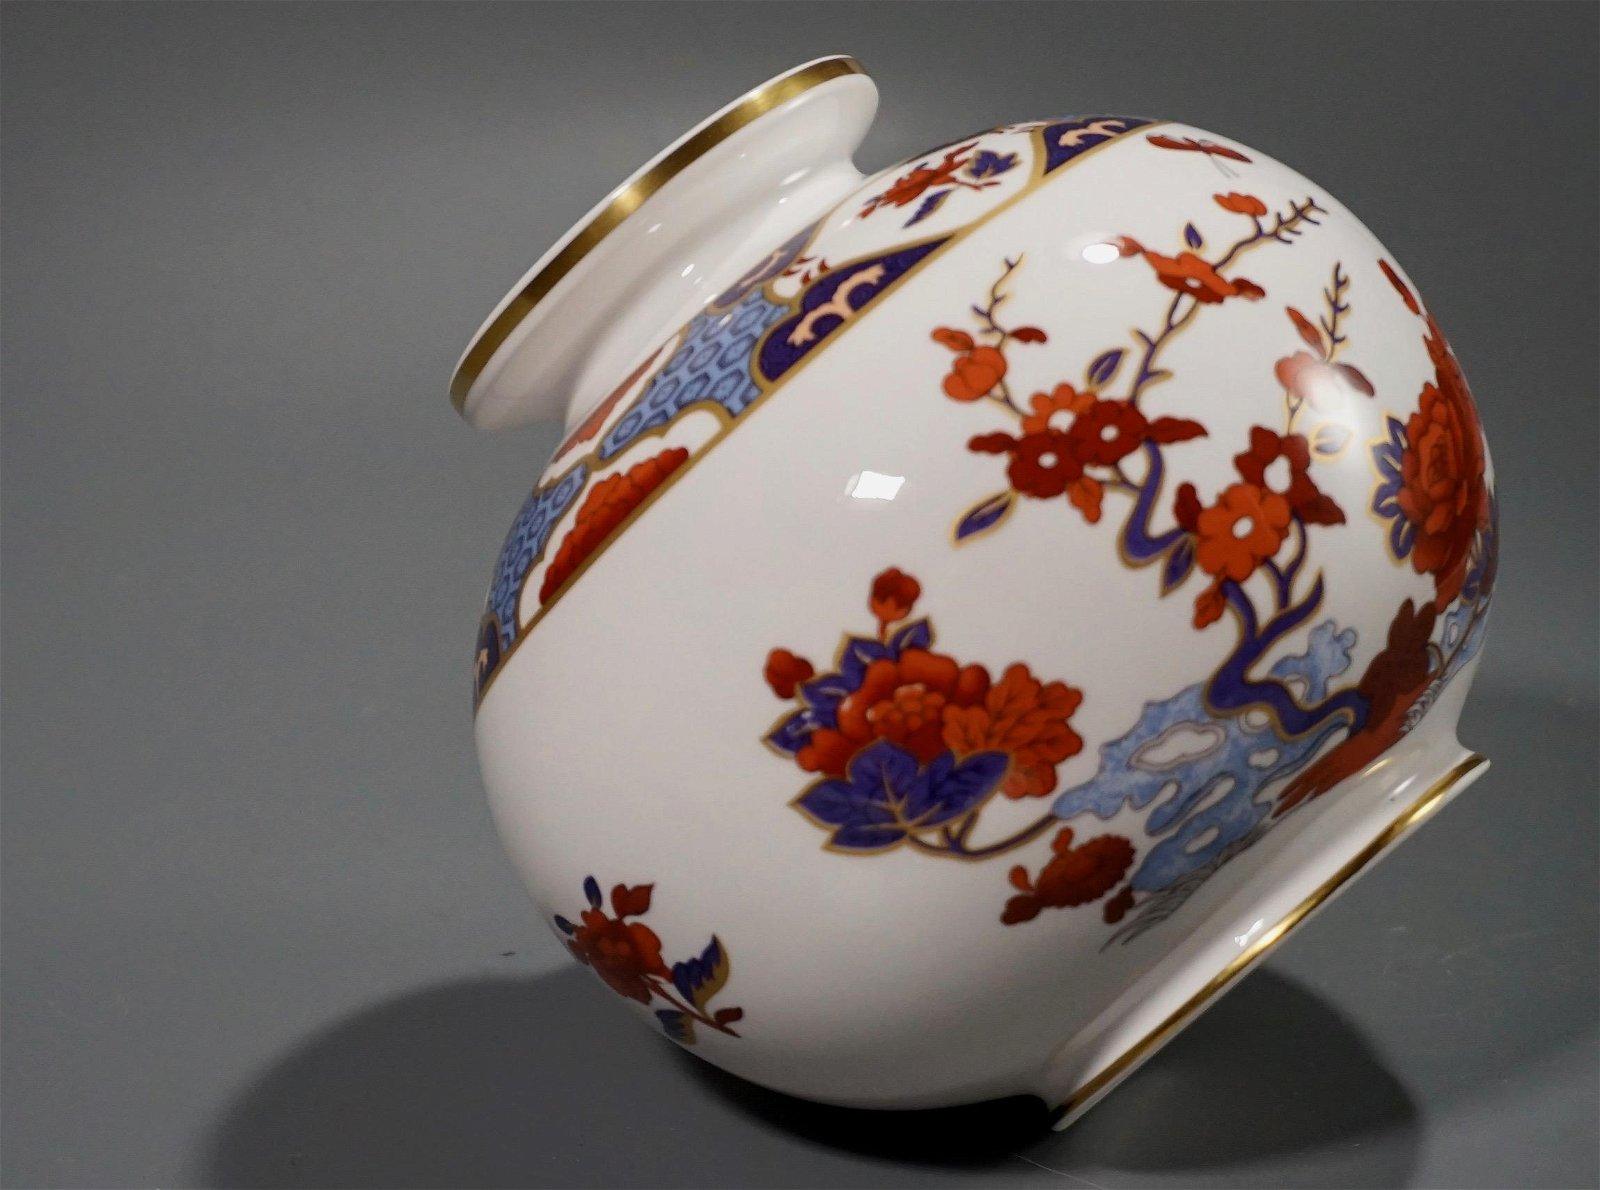 Vintage Spode China Shima Vase Made In England